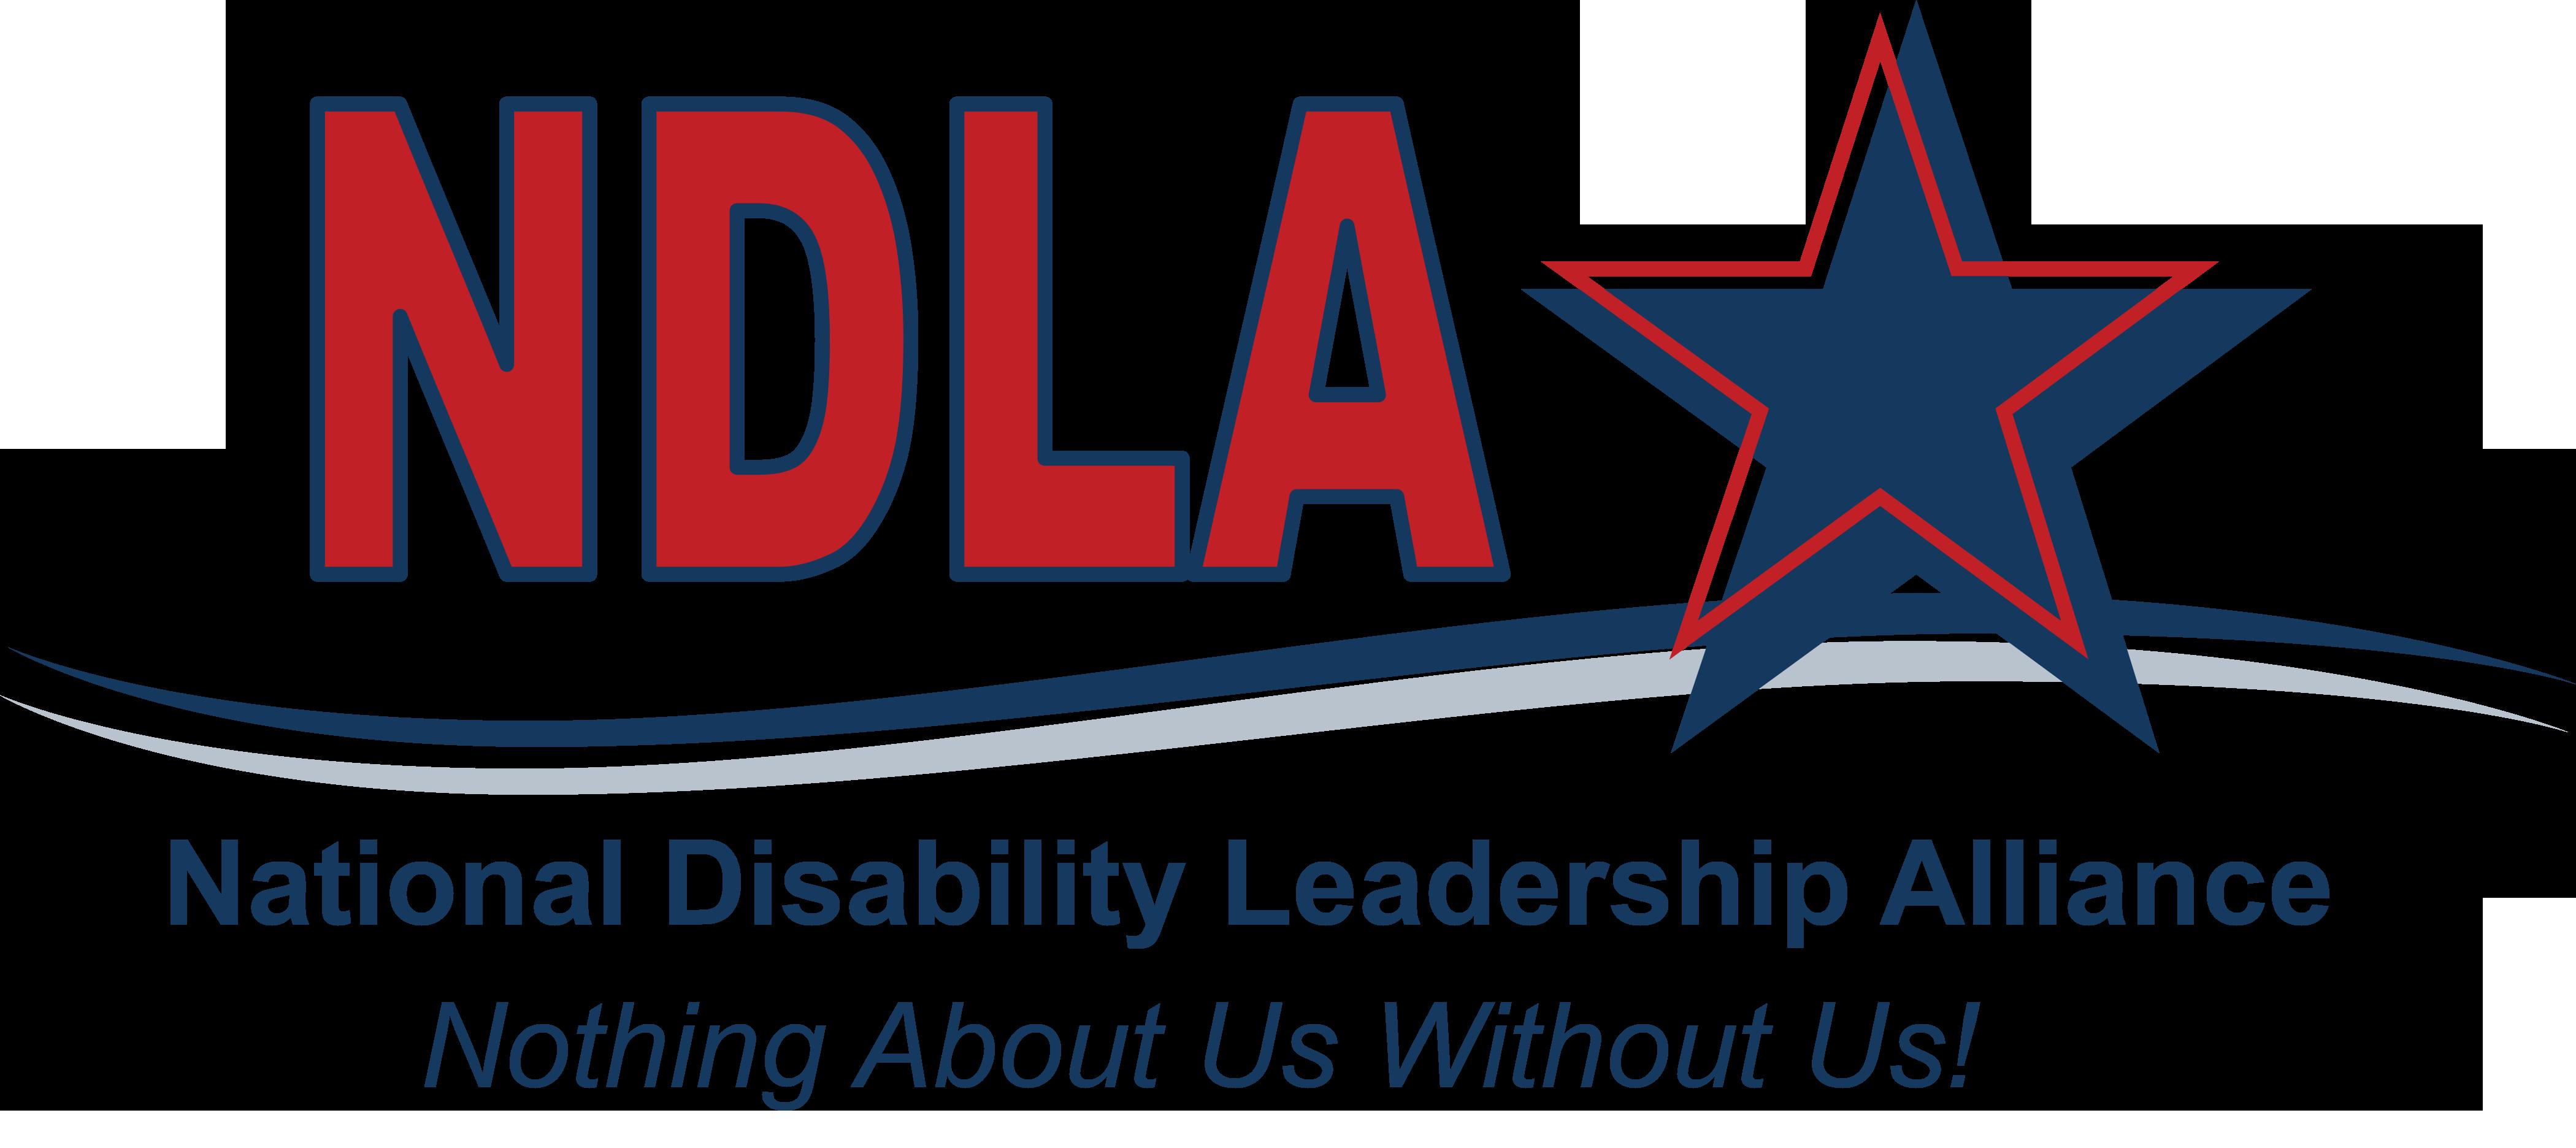 NATIONAL DISABILITY LEADERSHIP ALLIANCE (NDLA) URGES NATIONAL PARK SERVICE TO MEET DISABILITY MANDATES